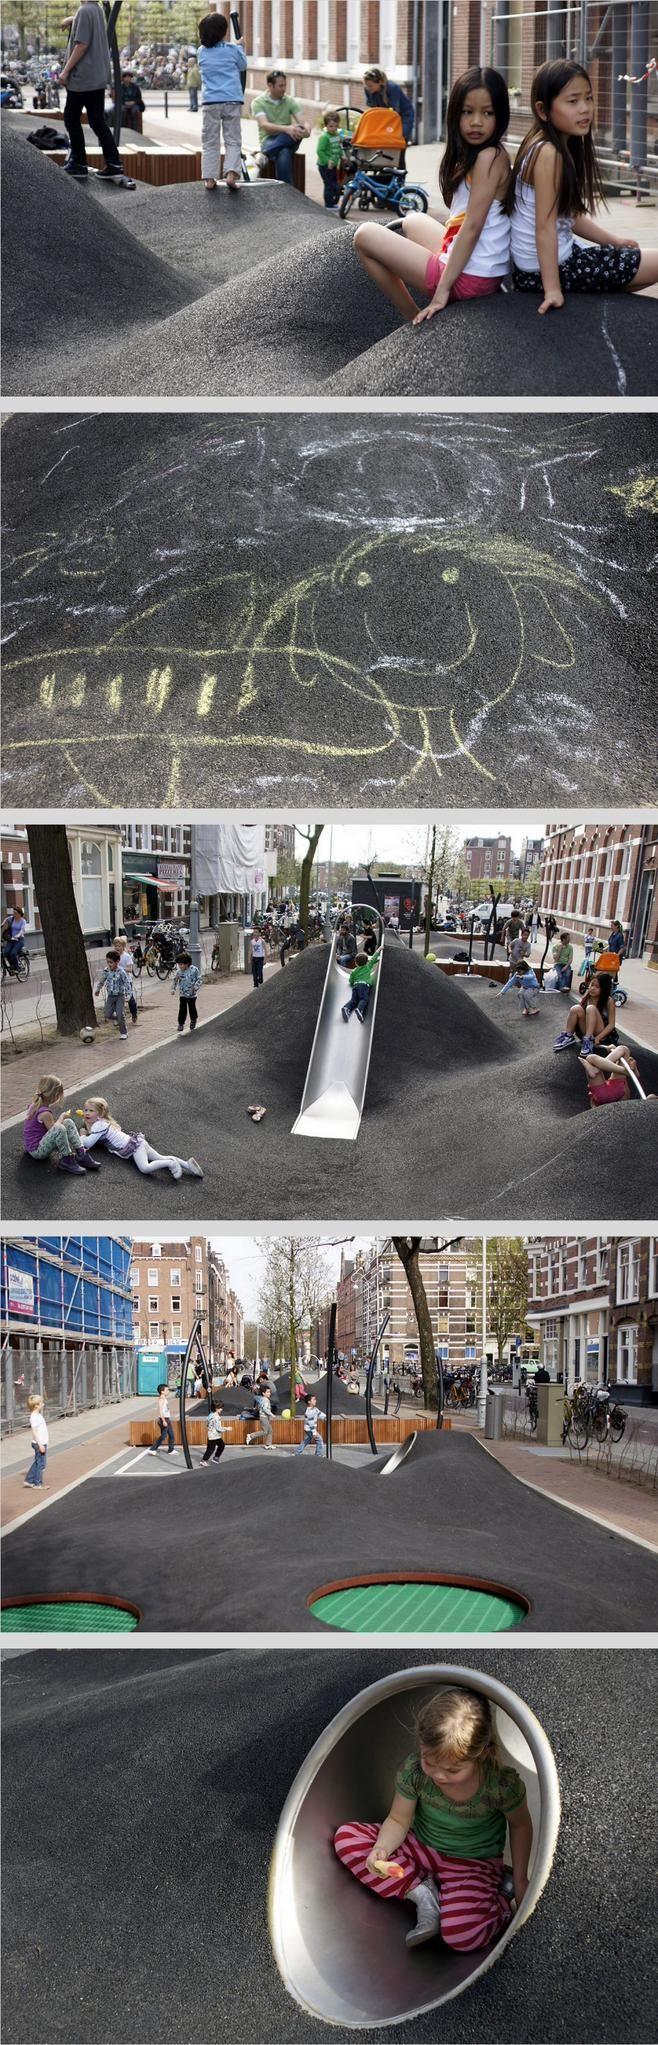 Amsterdam Urban Landscape Design www.best-landscaping-ideas.com